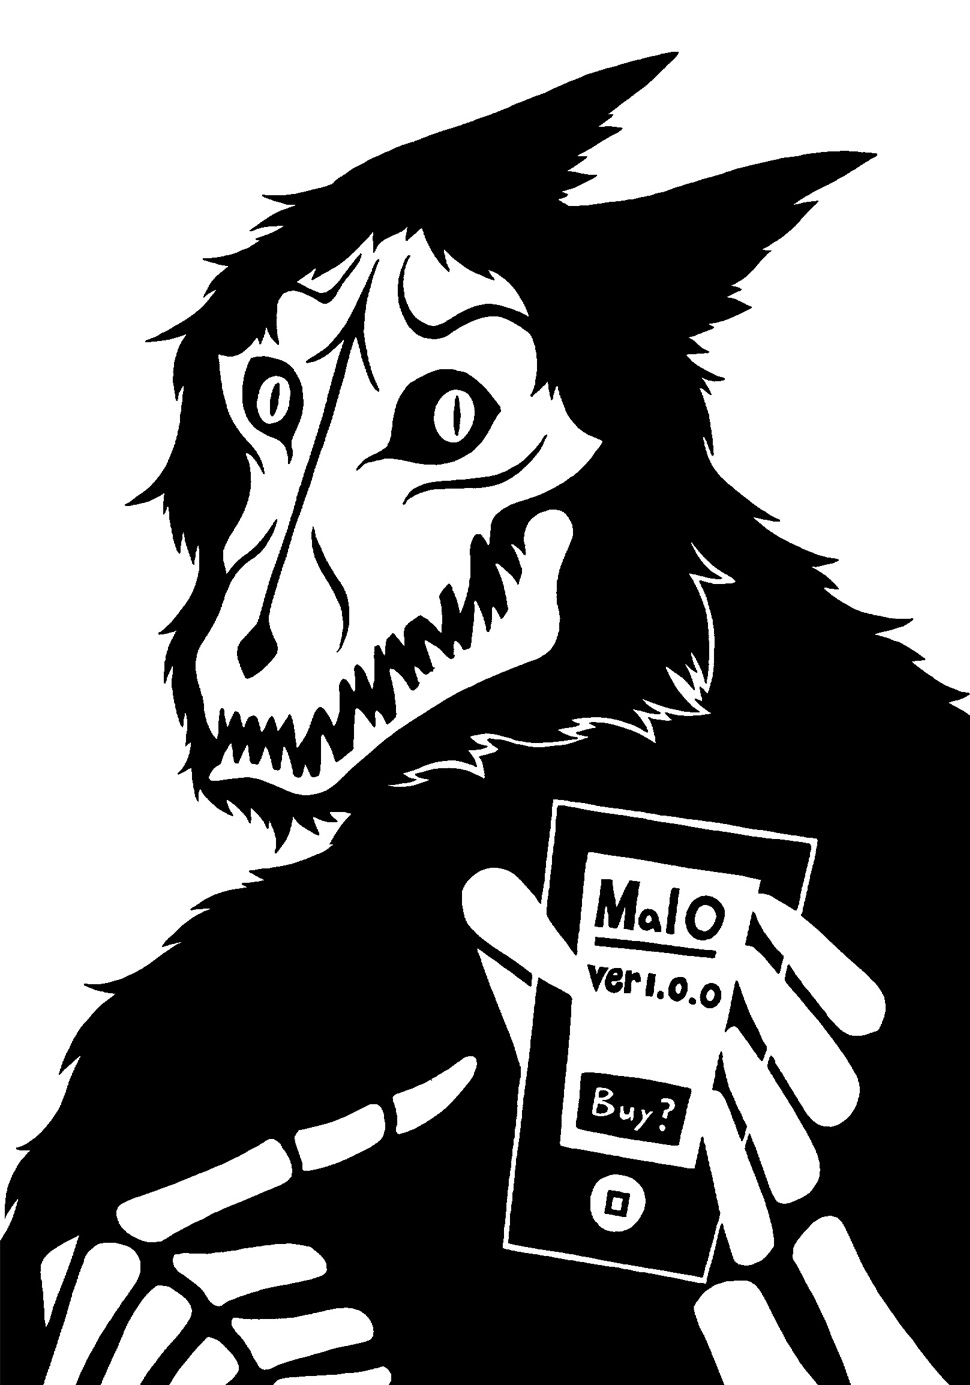 SCP-1471 - MalO 1.0.0版